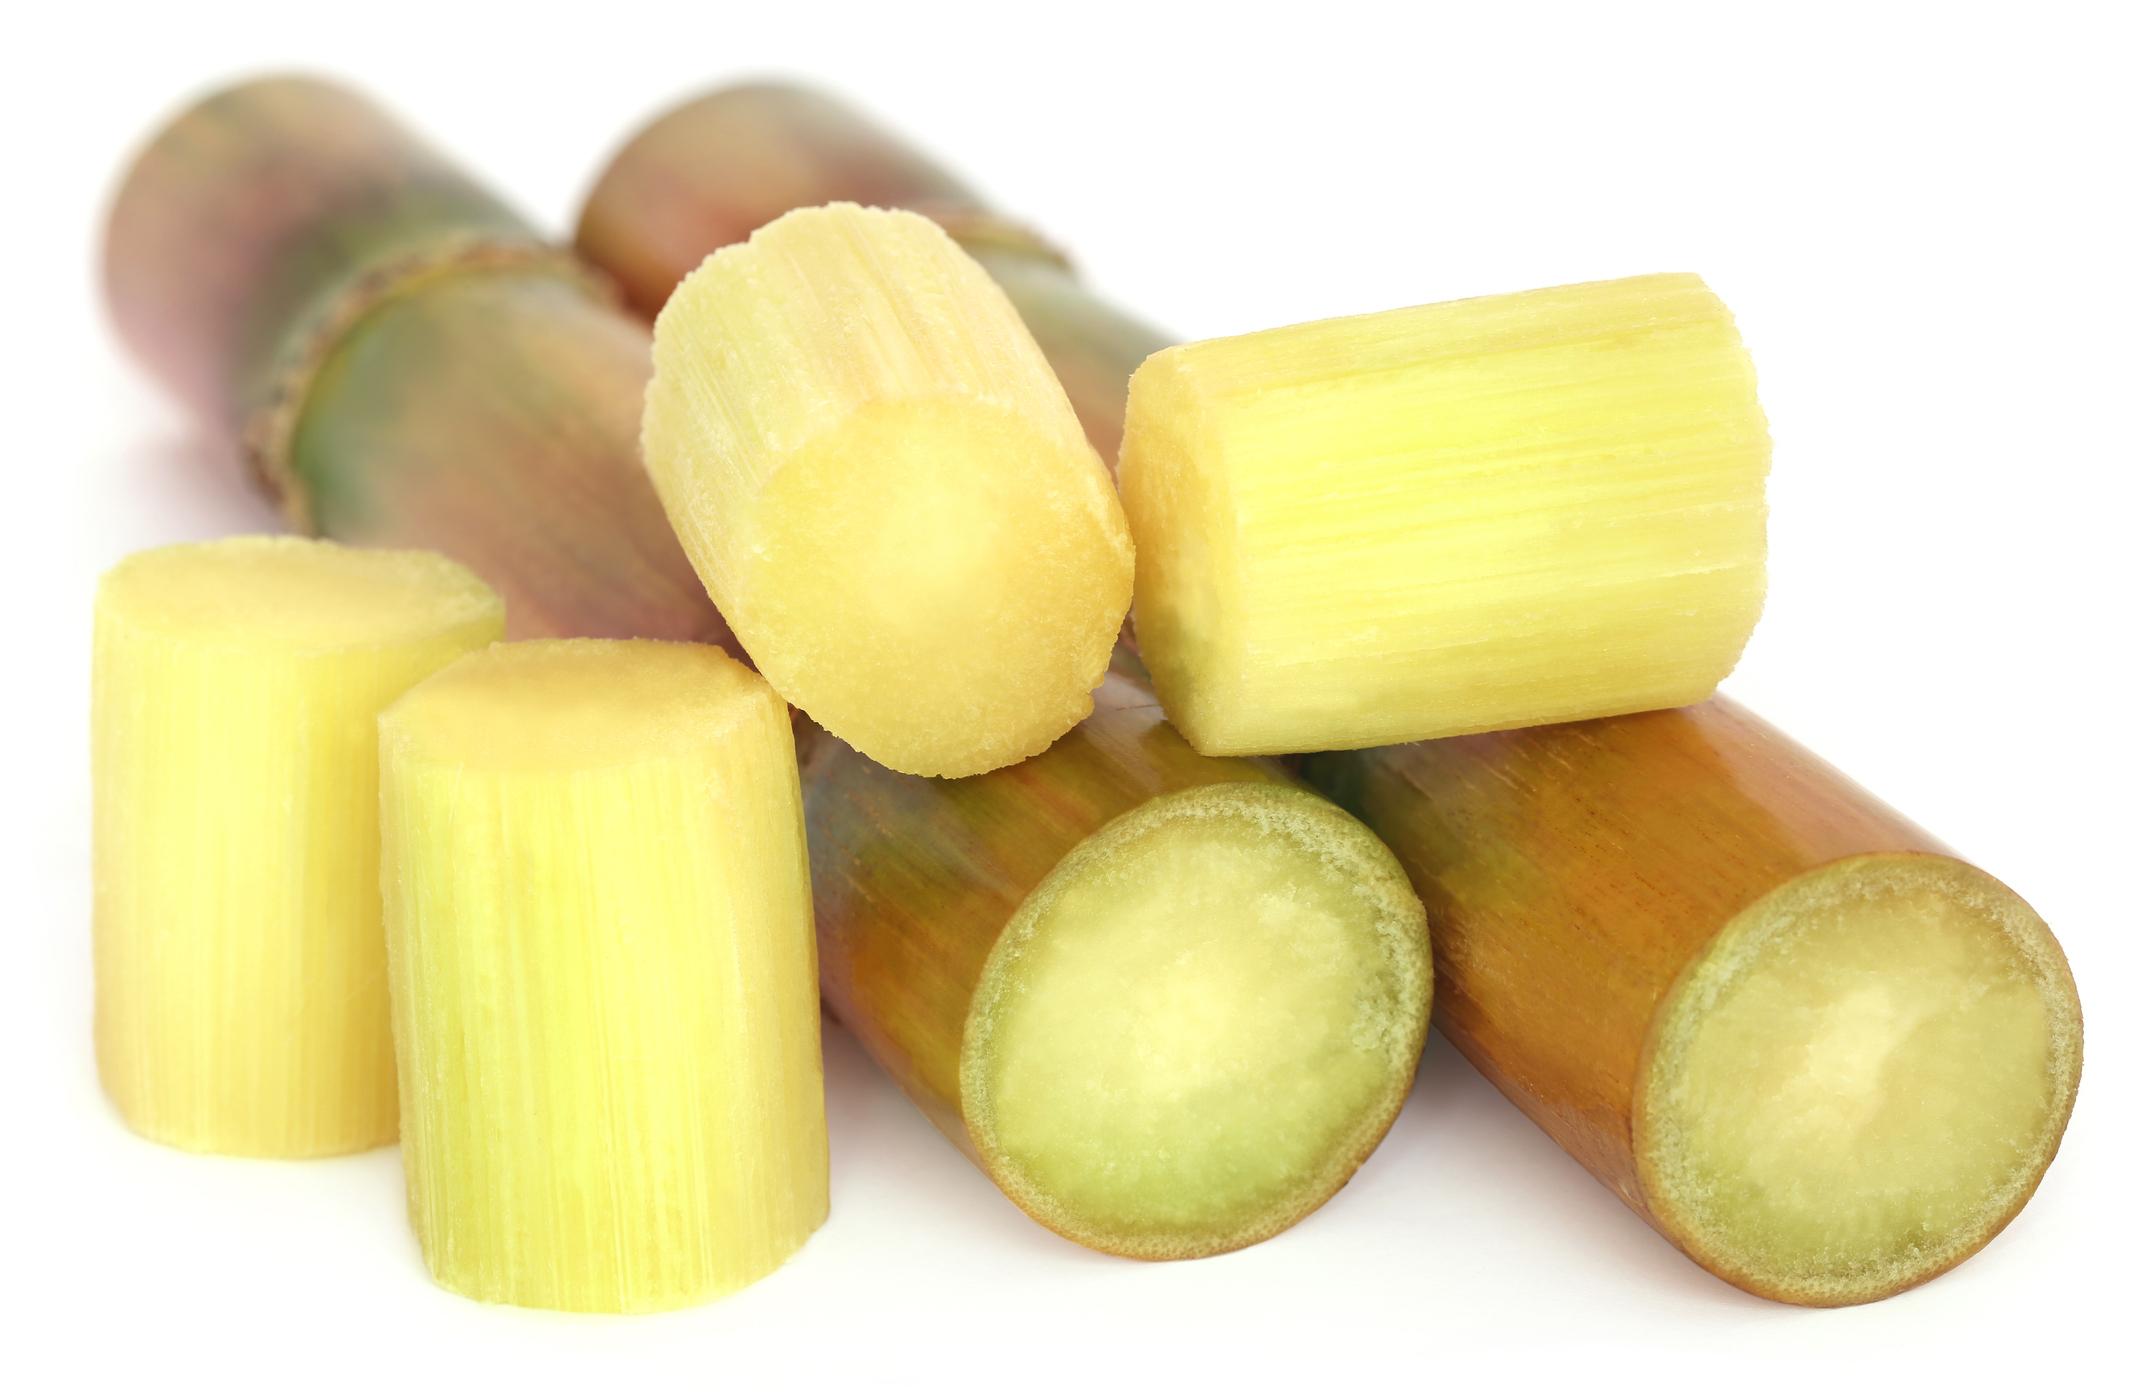 Sugar Cane Stalks and Chews